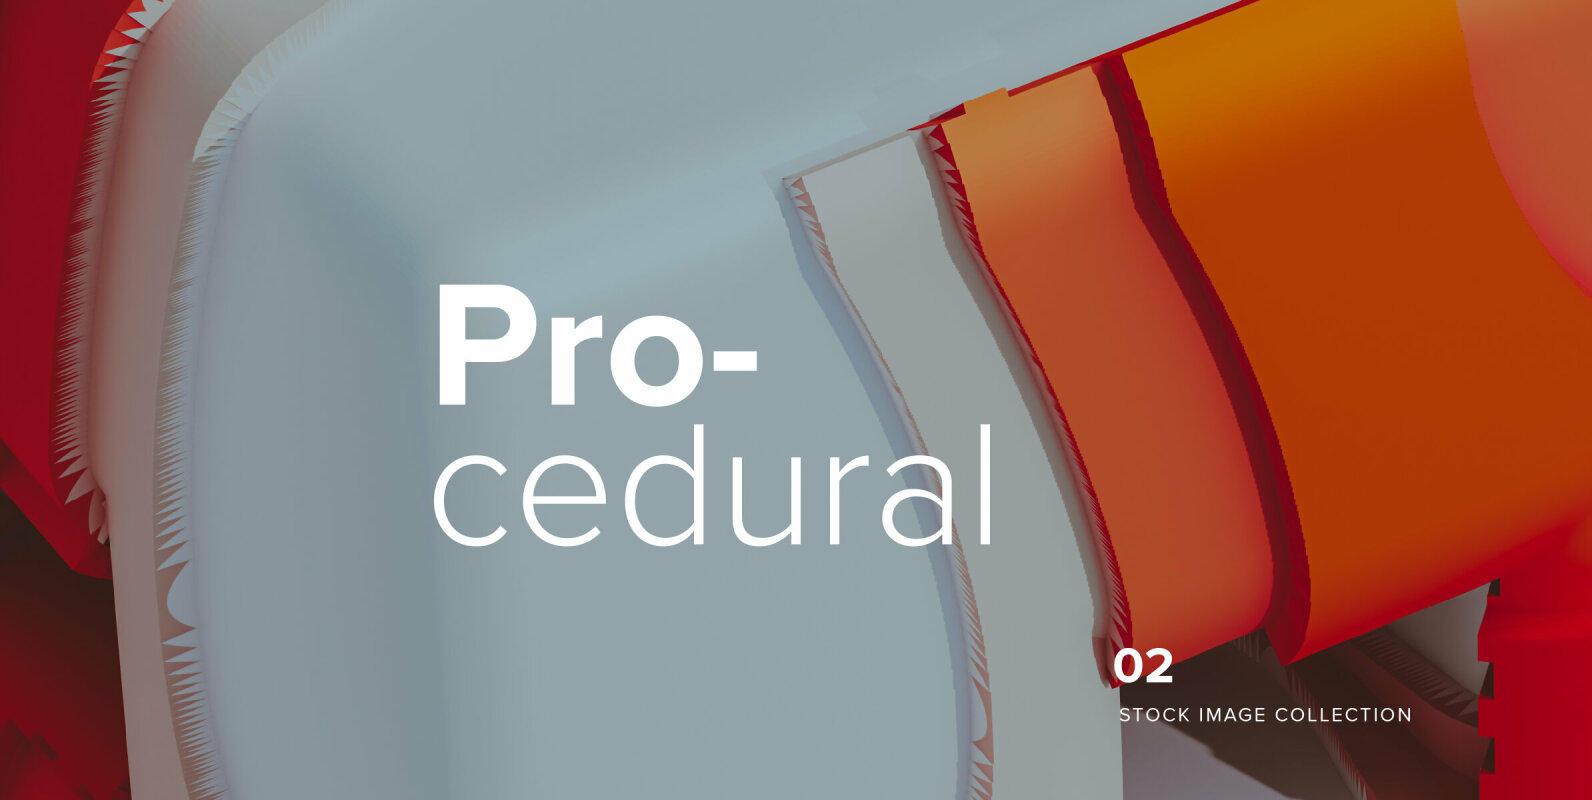 Procedural 02